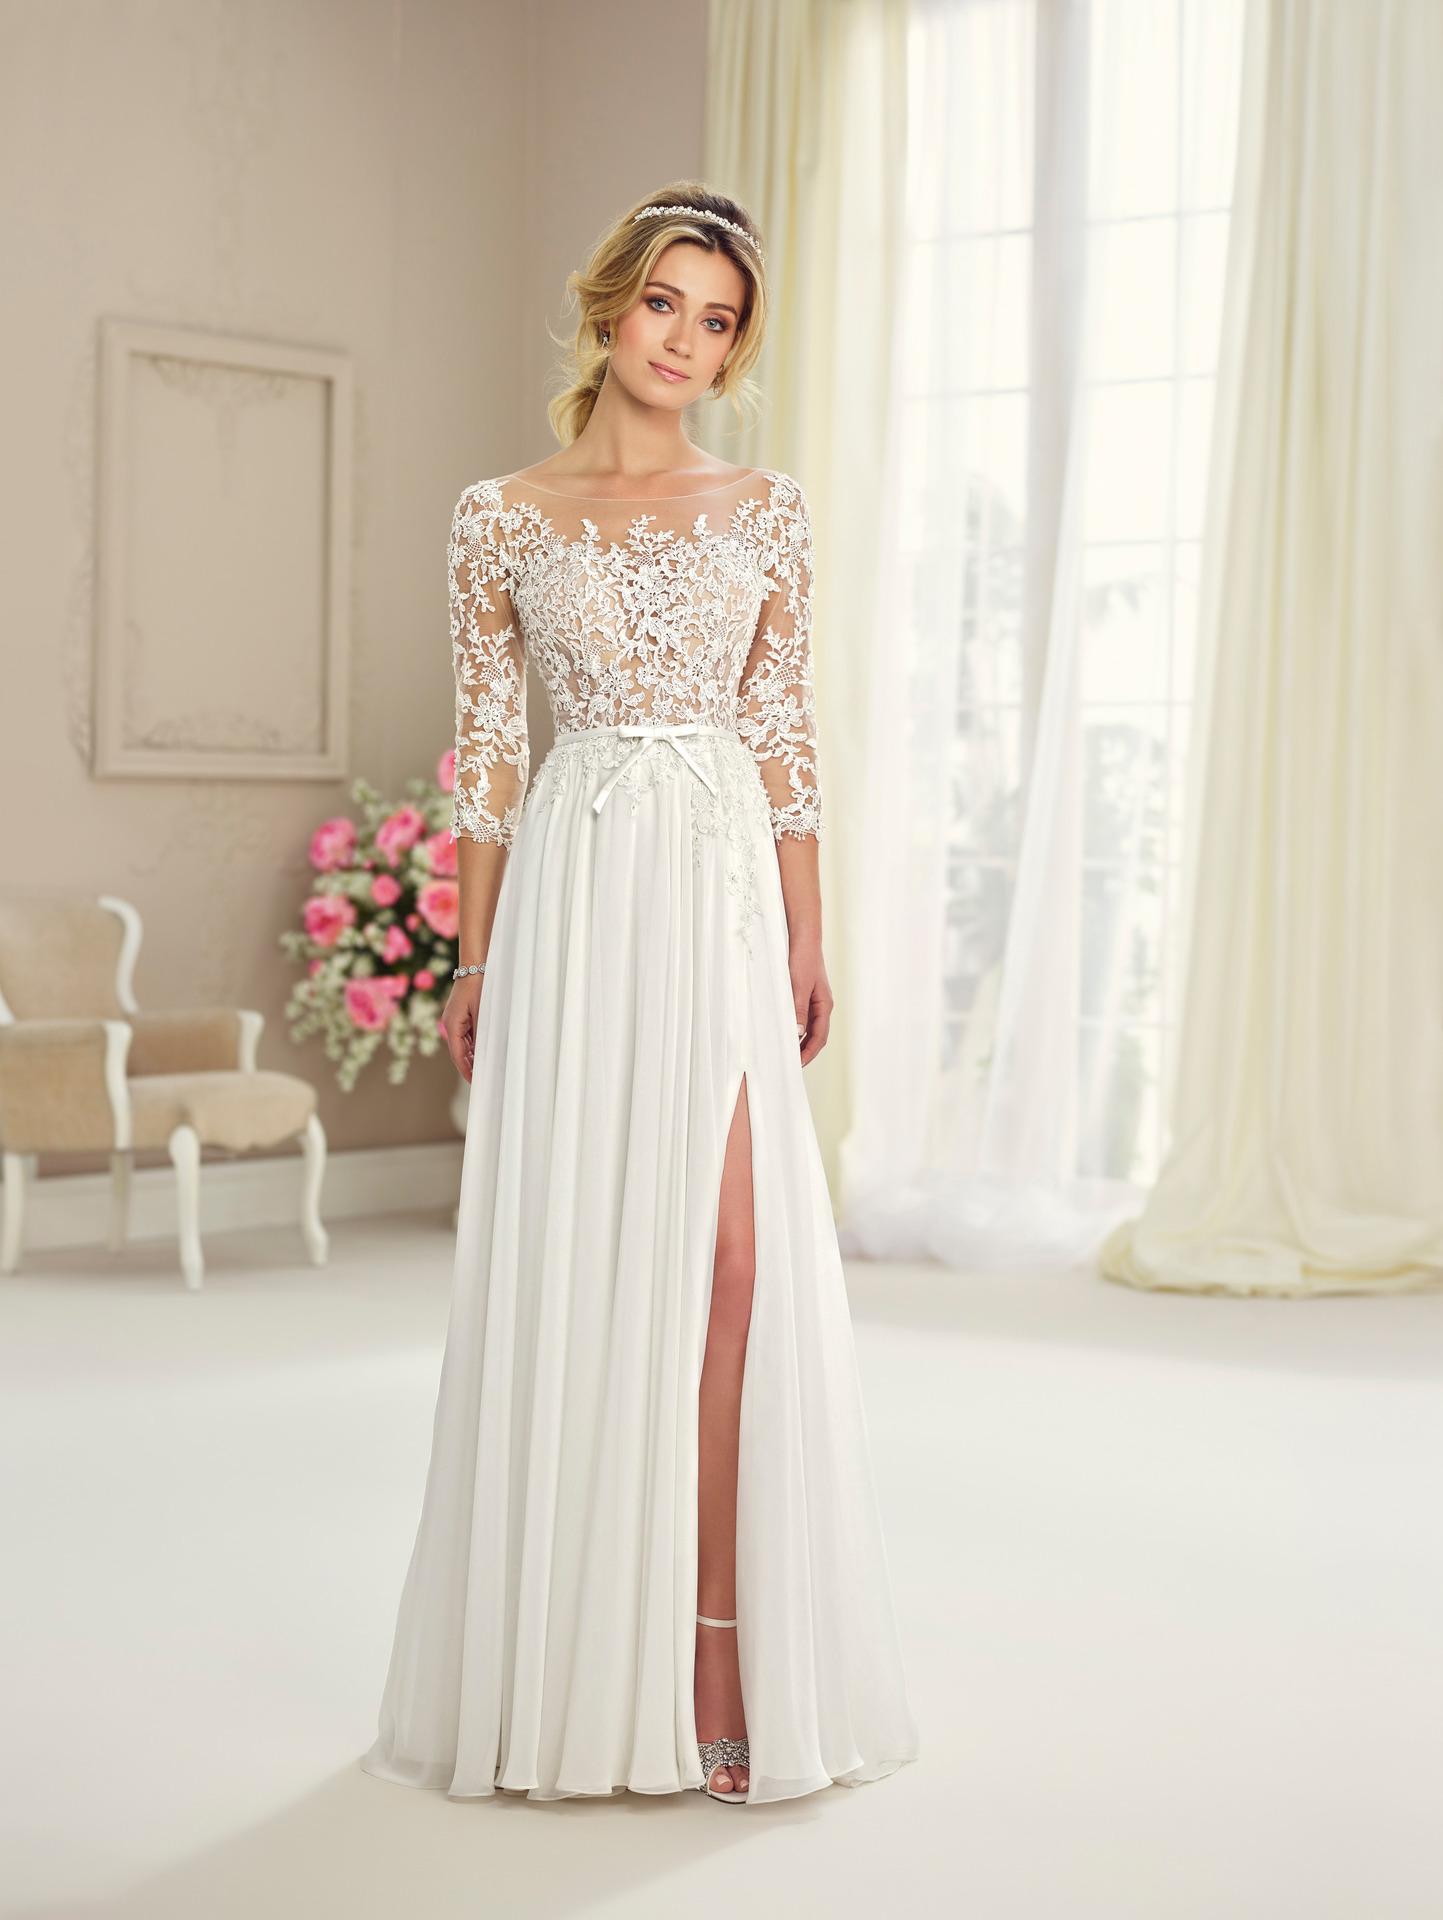 9ffce64138b Απλό ρομαντικό νυφικό σε γραμμή Α Enchanting 217108 - Venetti